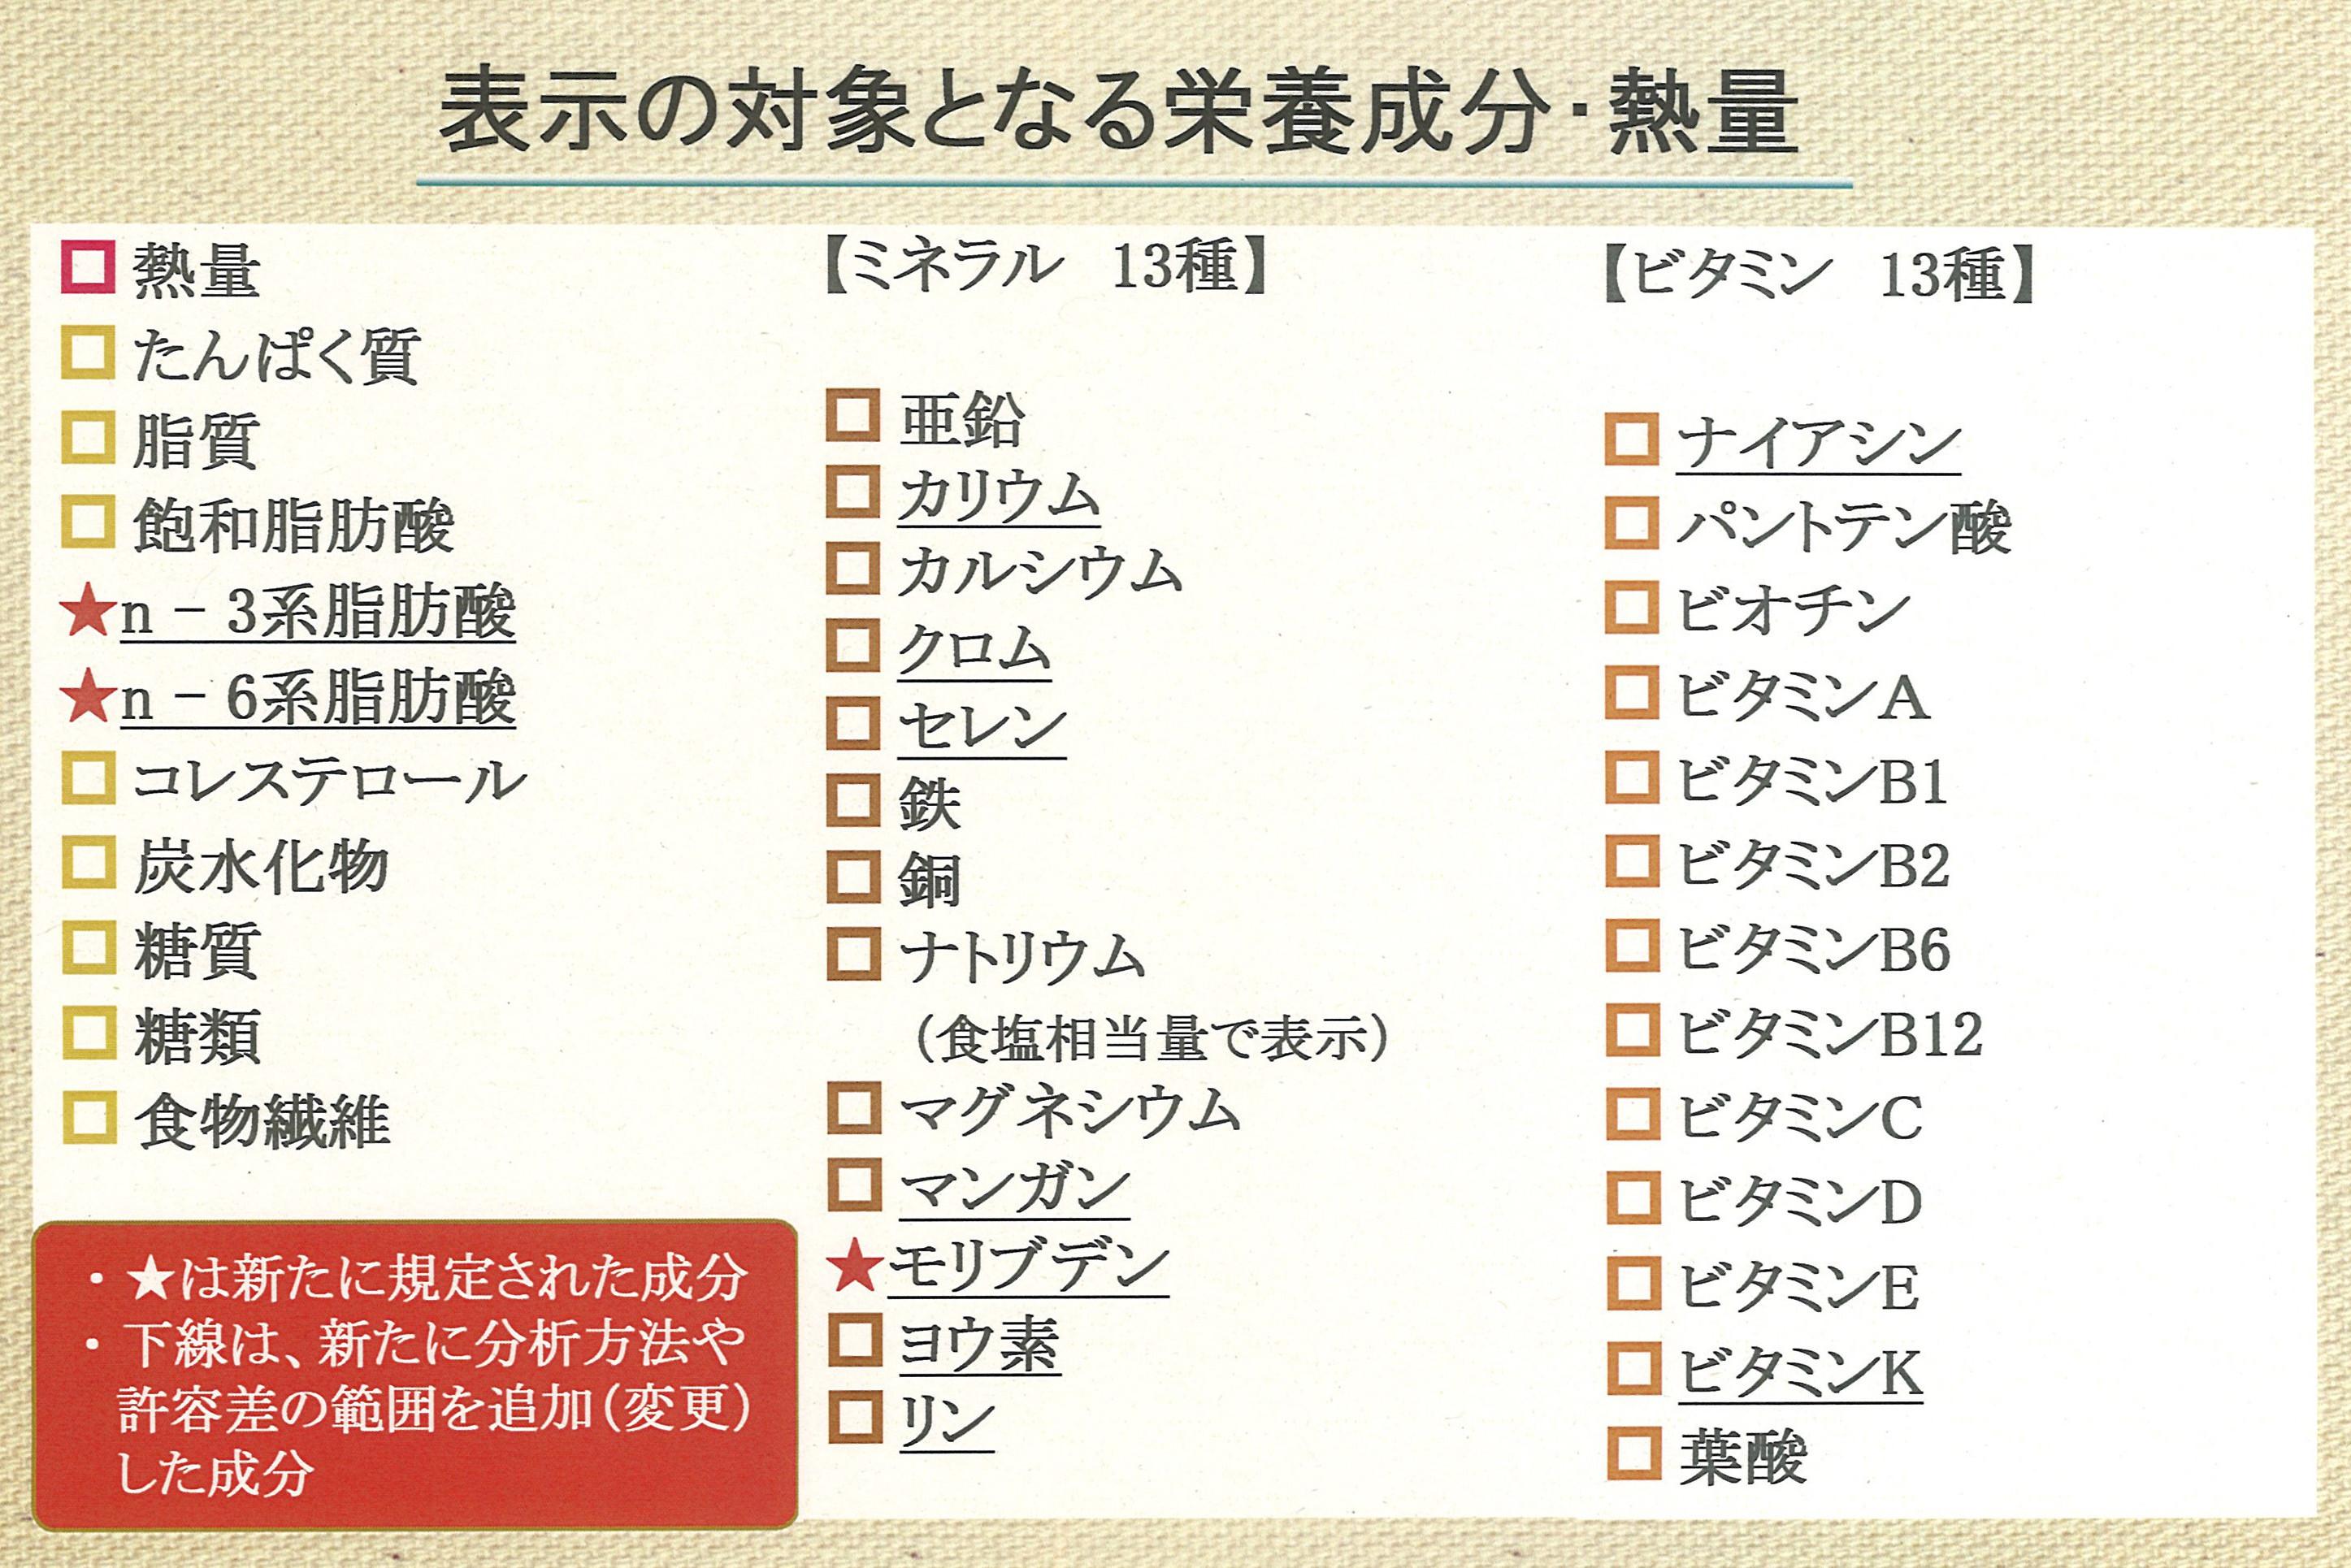 https://anshin.pref.tokushima.jp/docs/2015081100615/files/taisyouseibun.jpg